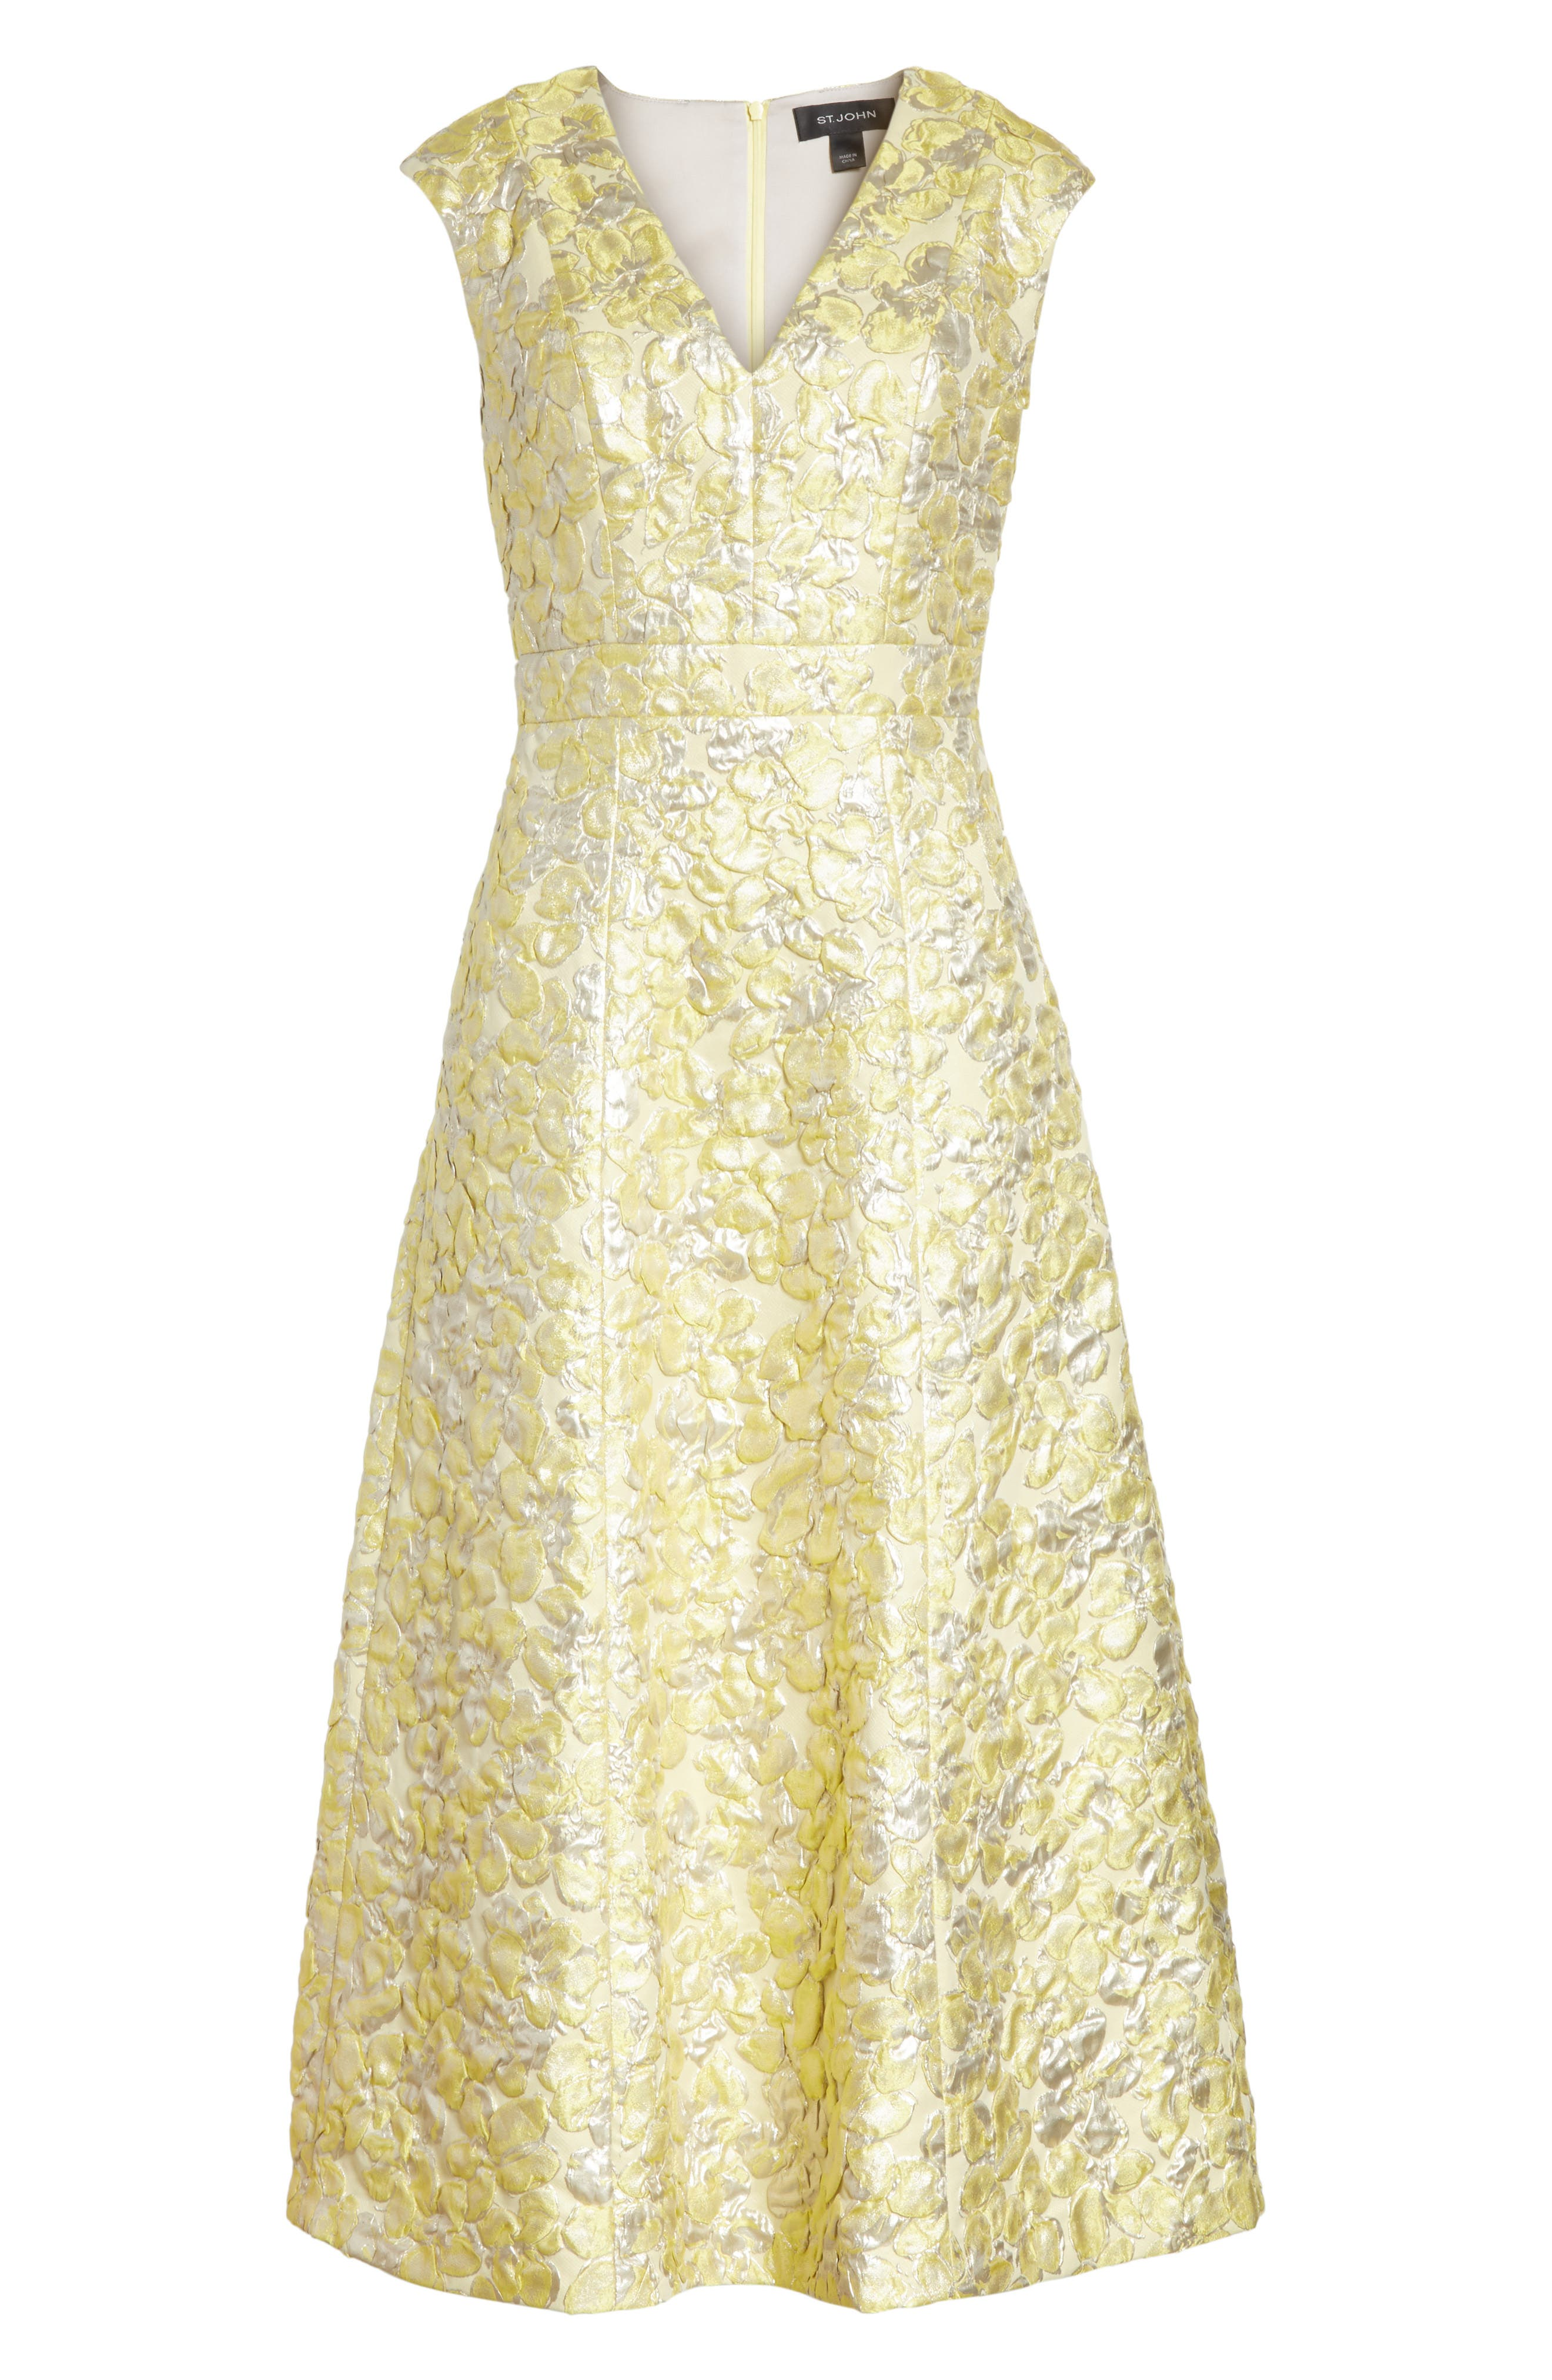 Metallic Floral Jacquard Dress,                             Alternate thumbnail 6, color,                             730